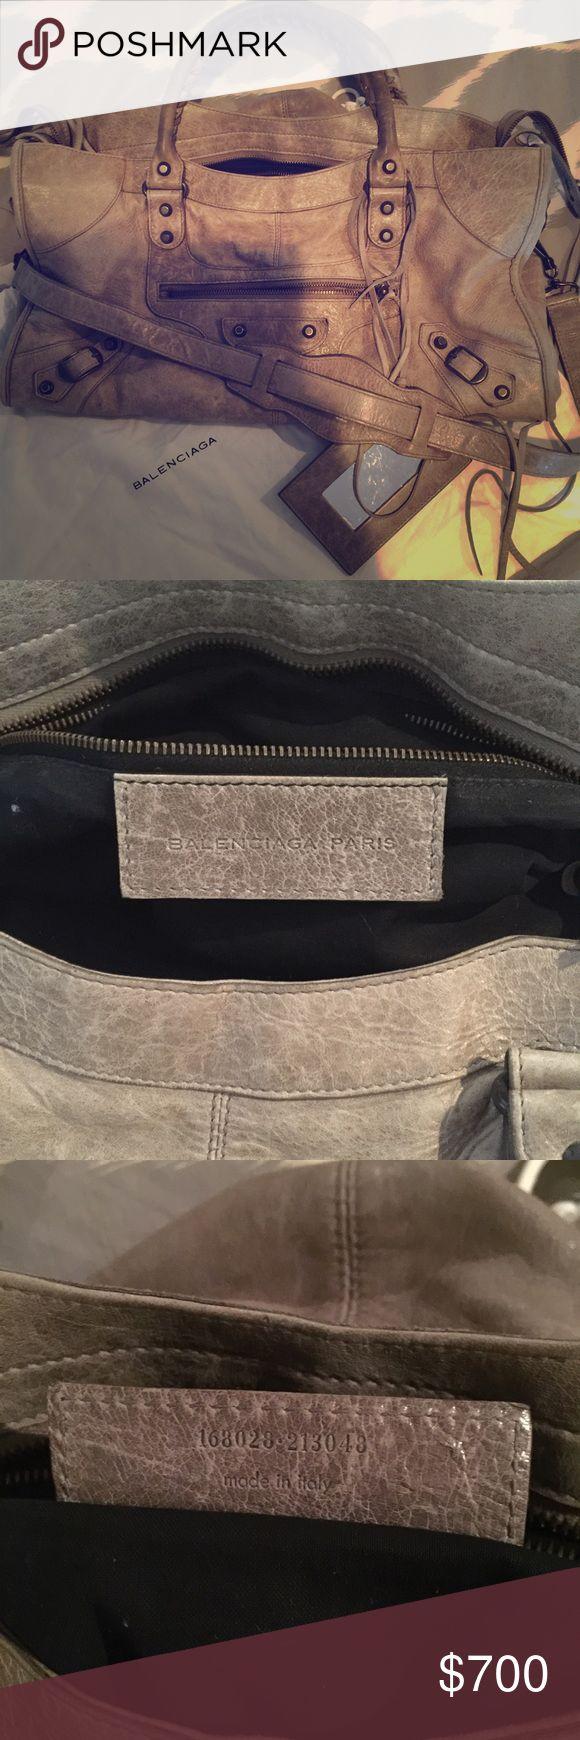 Balenciaga City Bag Classic and amazing grey Balenciaga City bag! Balenciaga Bags Shoulder Bags